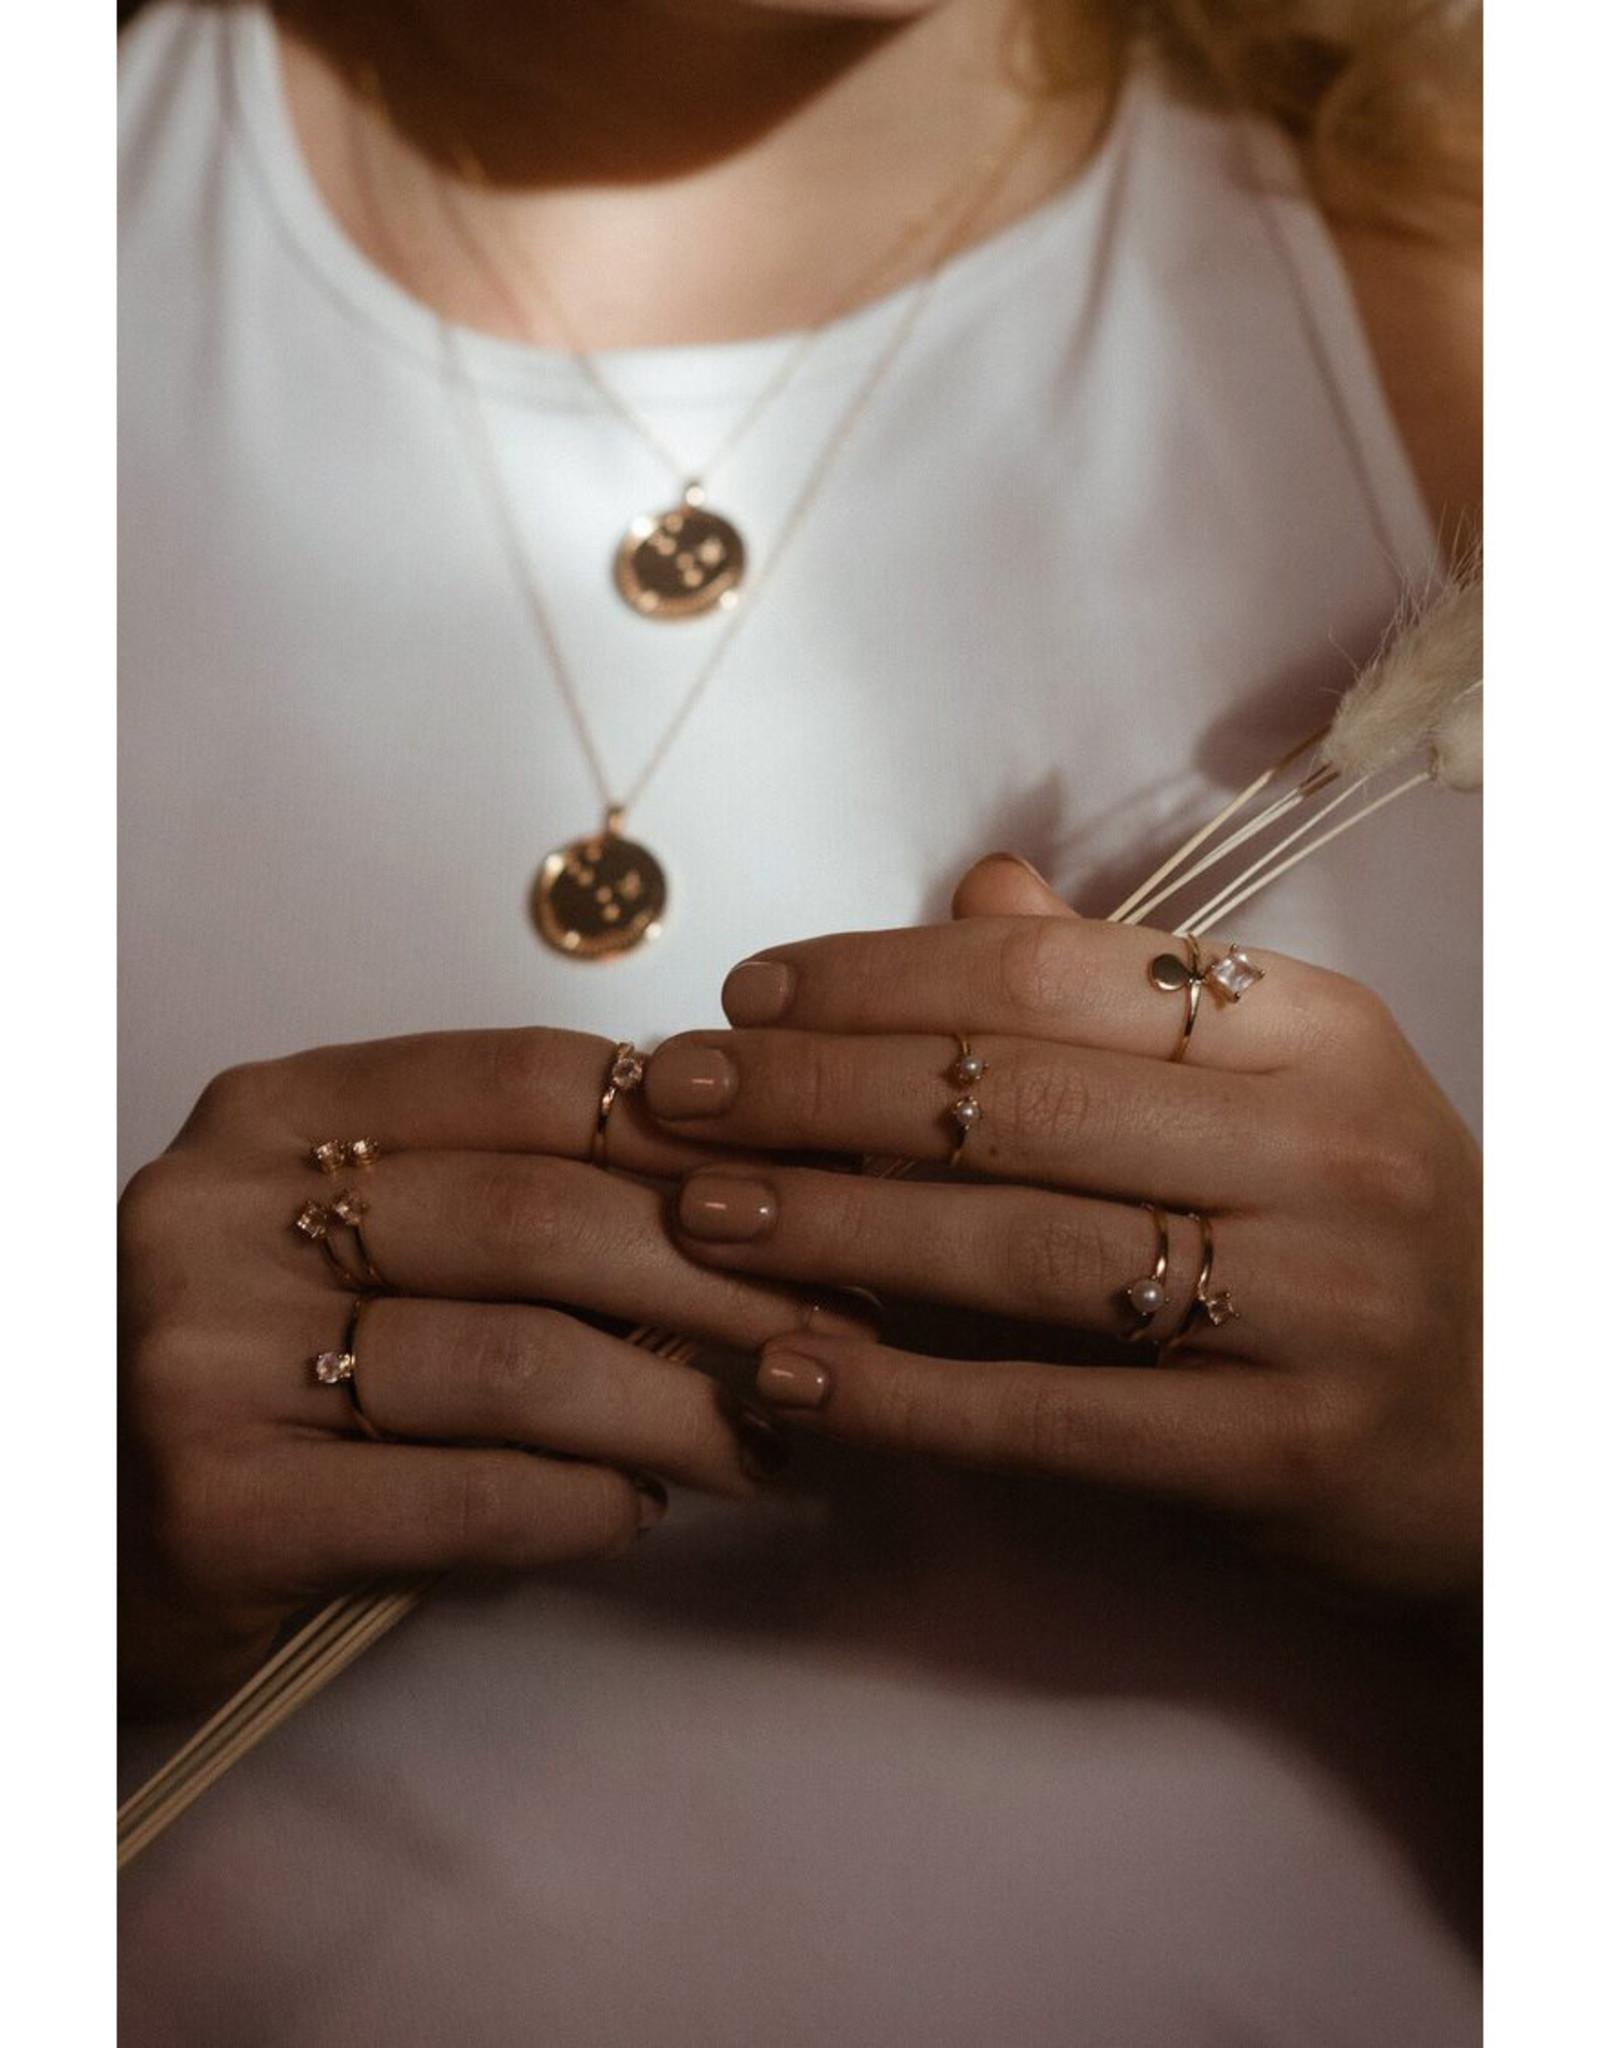 Sarah Mulder Jewelry Silver Cassie Ring - Rose Quartz + Pearl - 8